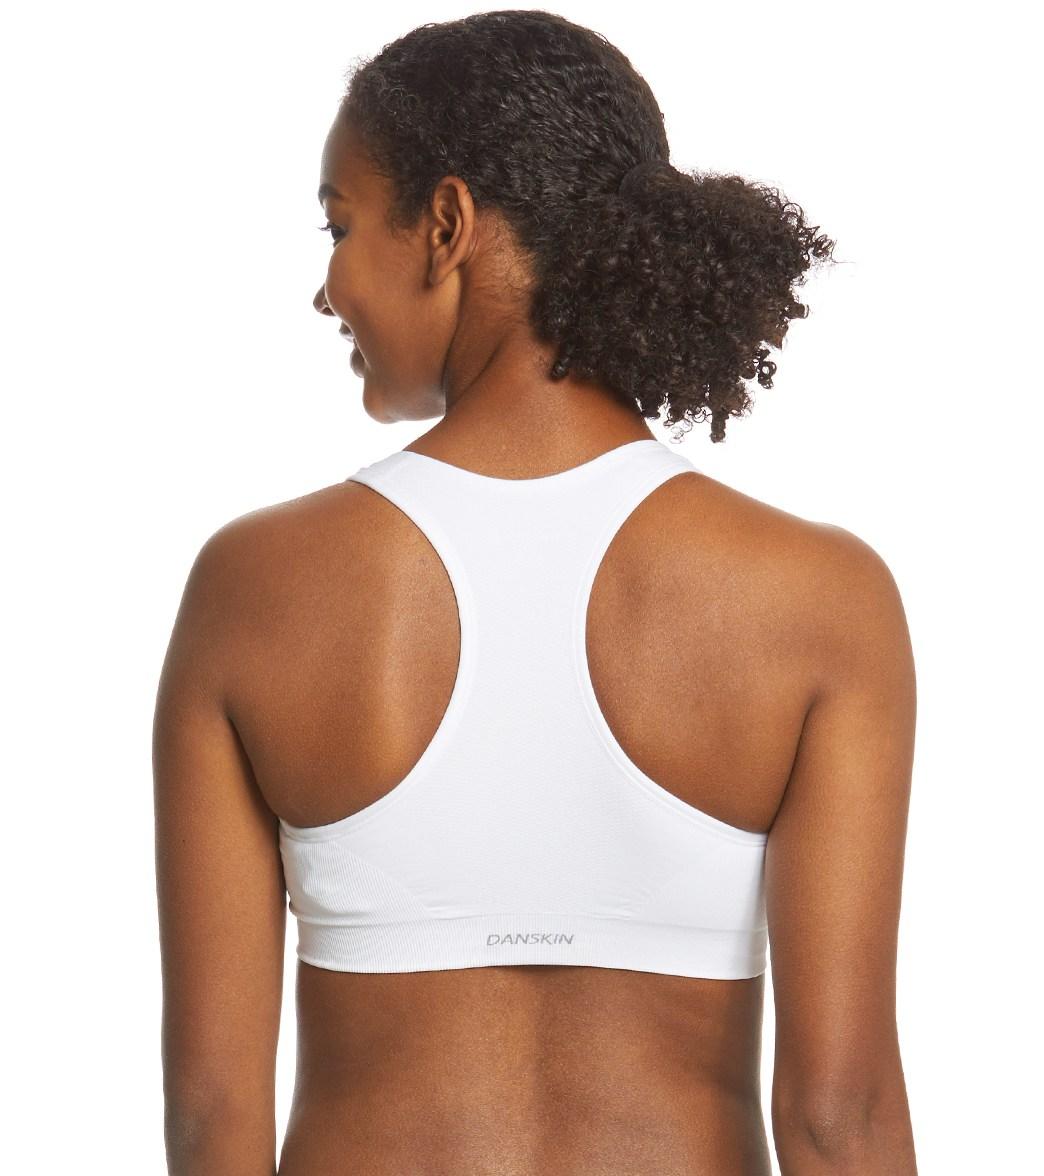 2443f2fc94760 Danskin Zip Front High Impact Seamless Yoga Sports Bra at YogaOutlet.com